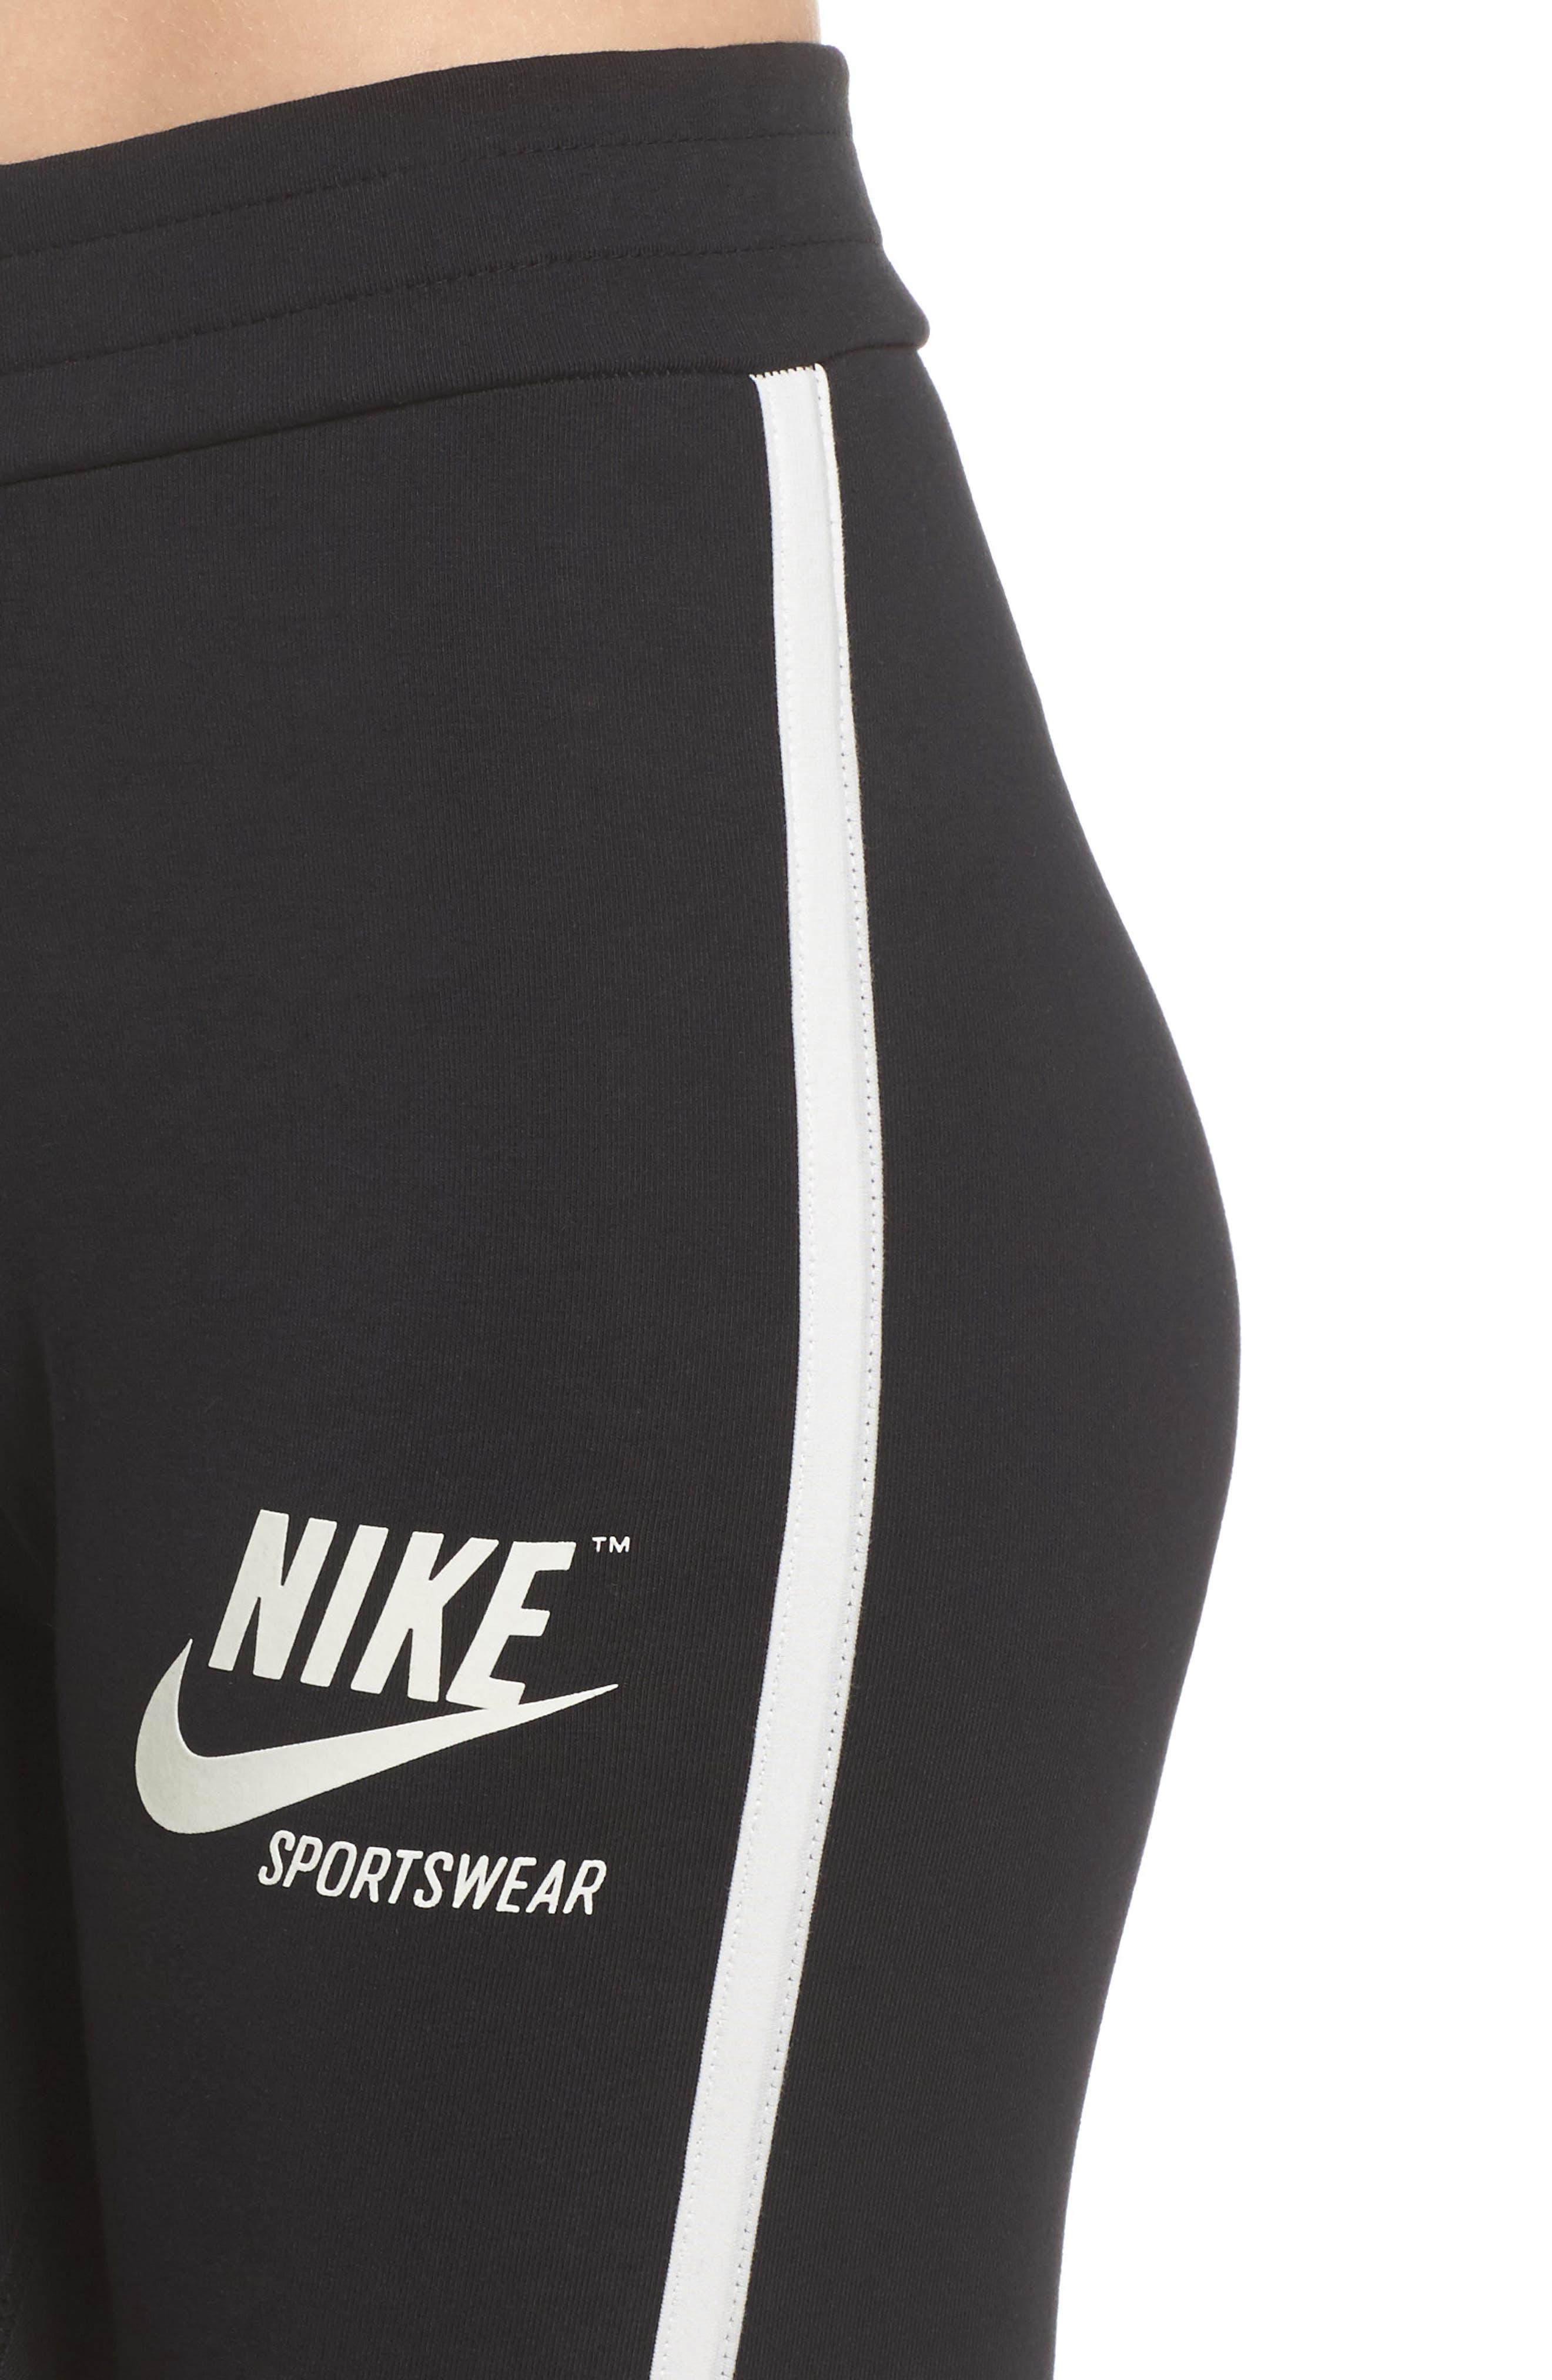 Sportswear Women's Leggings,                             Alternate thumbnail 4, color,                             Black/ Sail